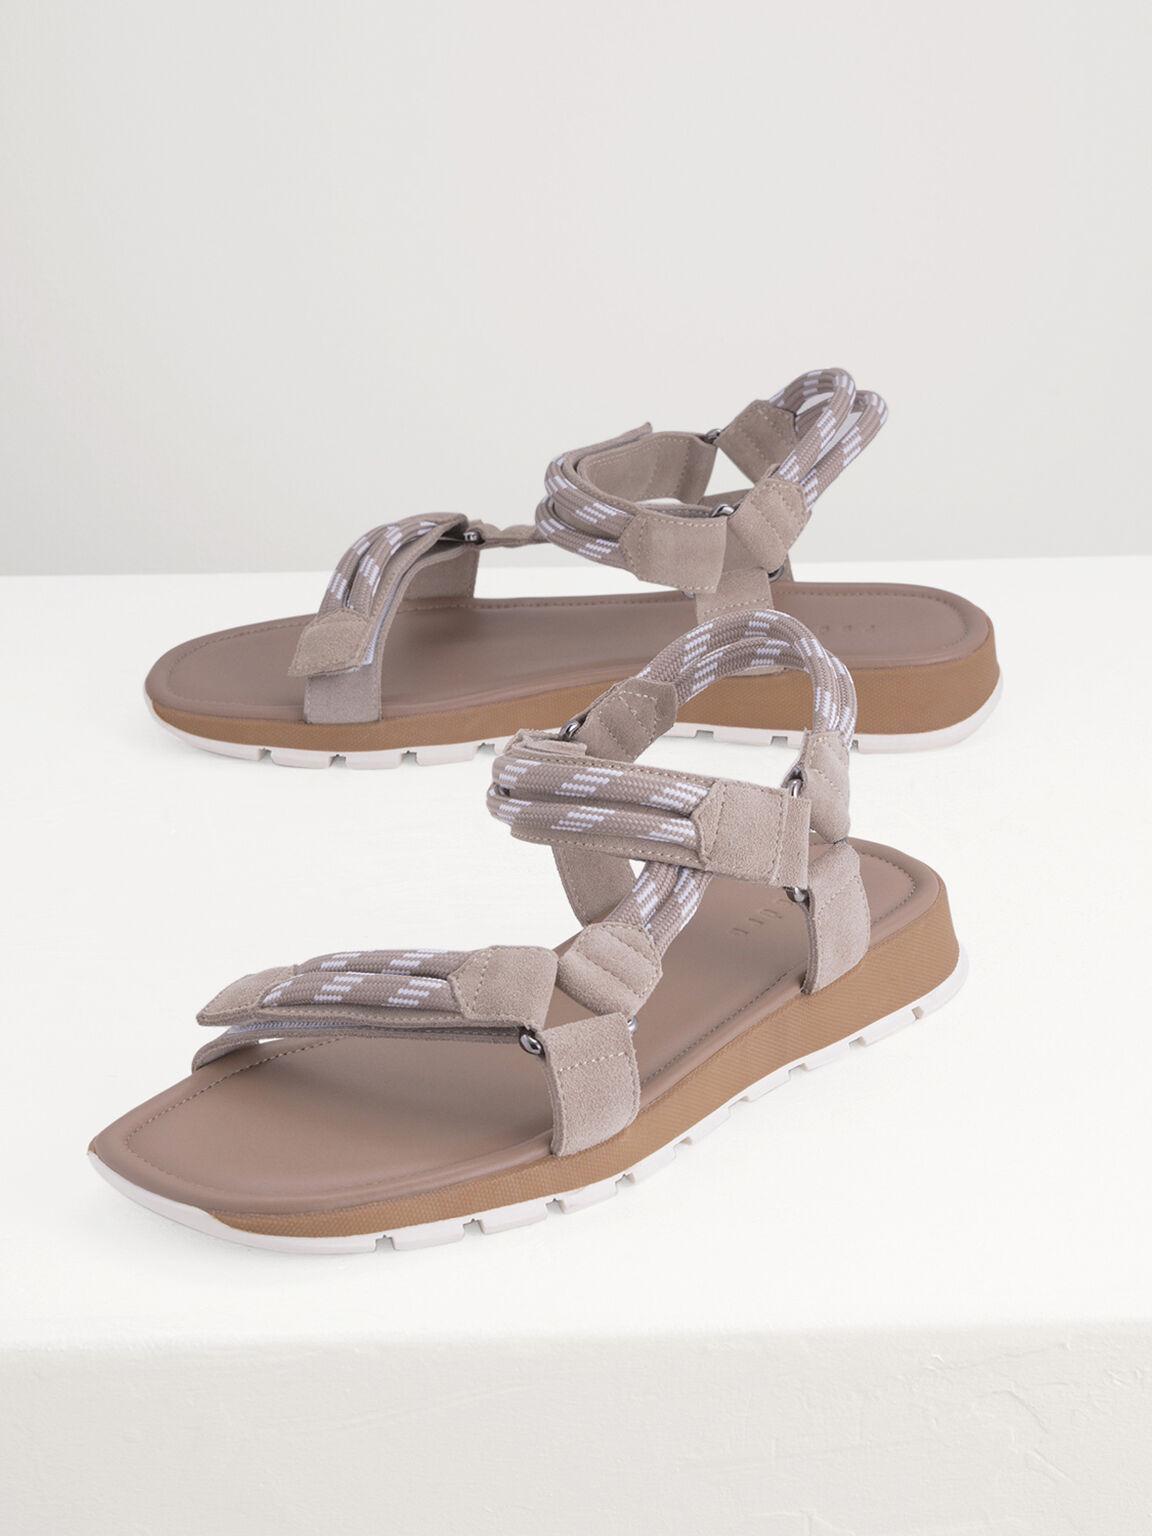 Rope Sandals, Taupe, hi-res